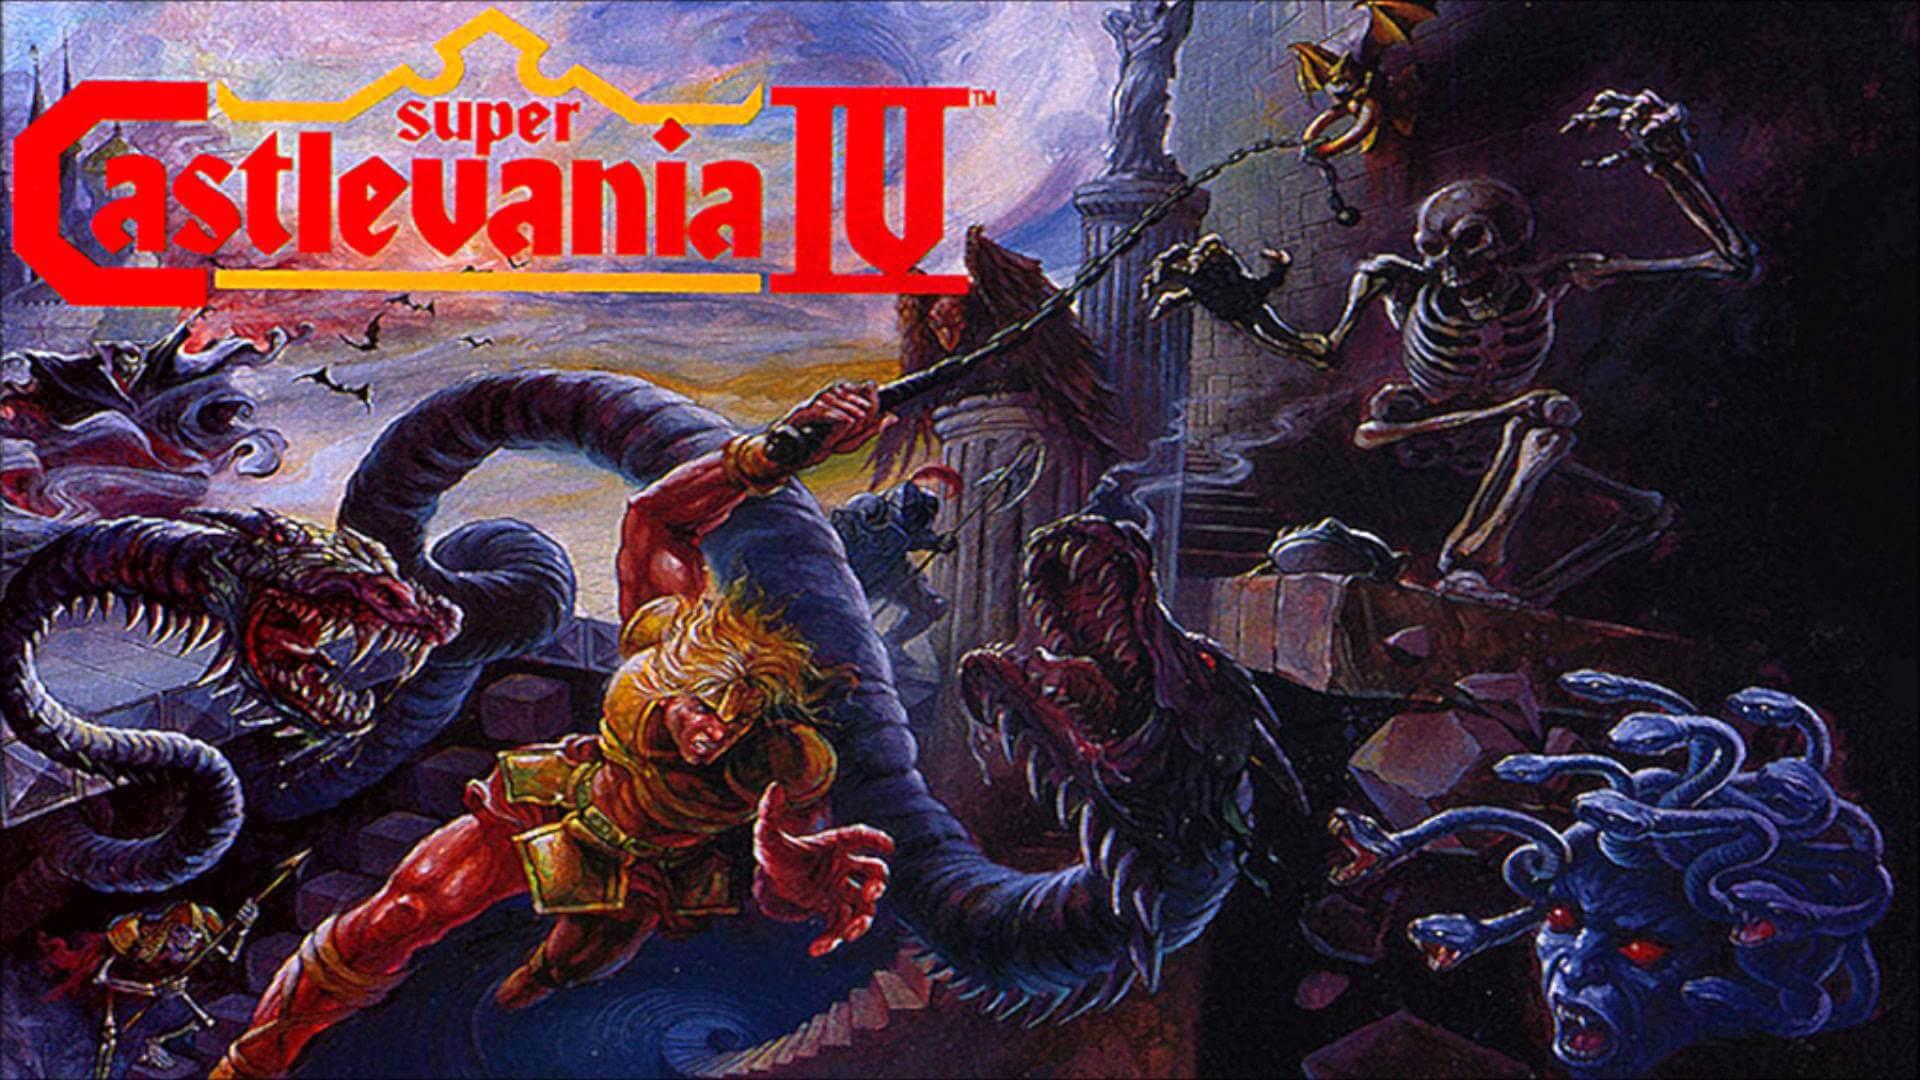 Wallpaper 1920x1080 Px Castlevania Super Castlevania Iv